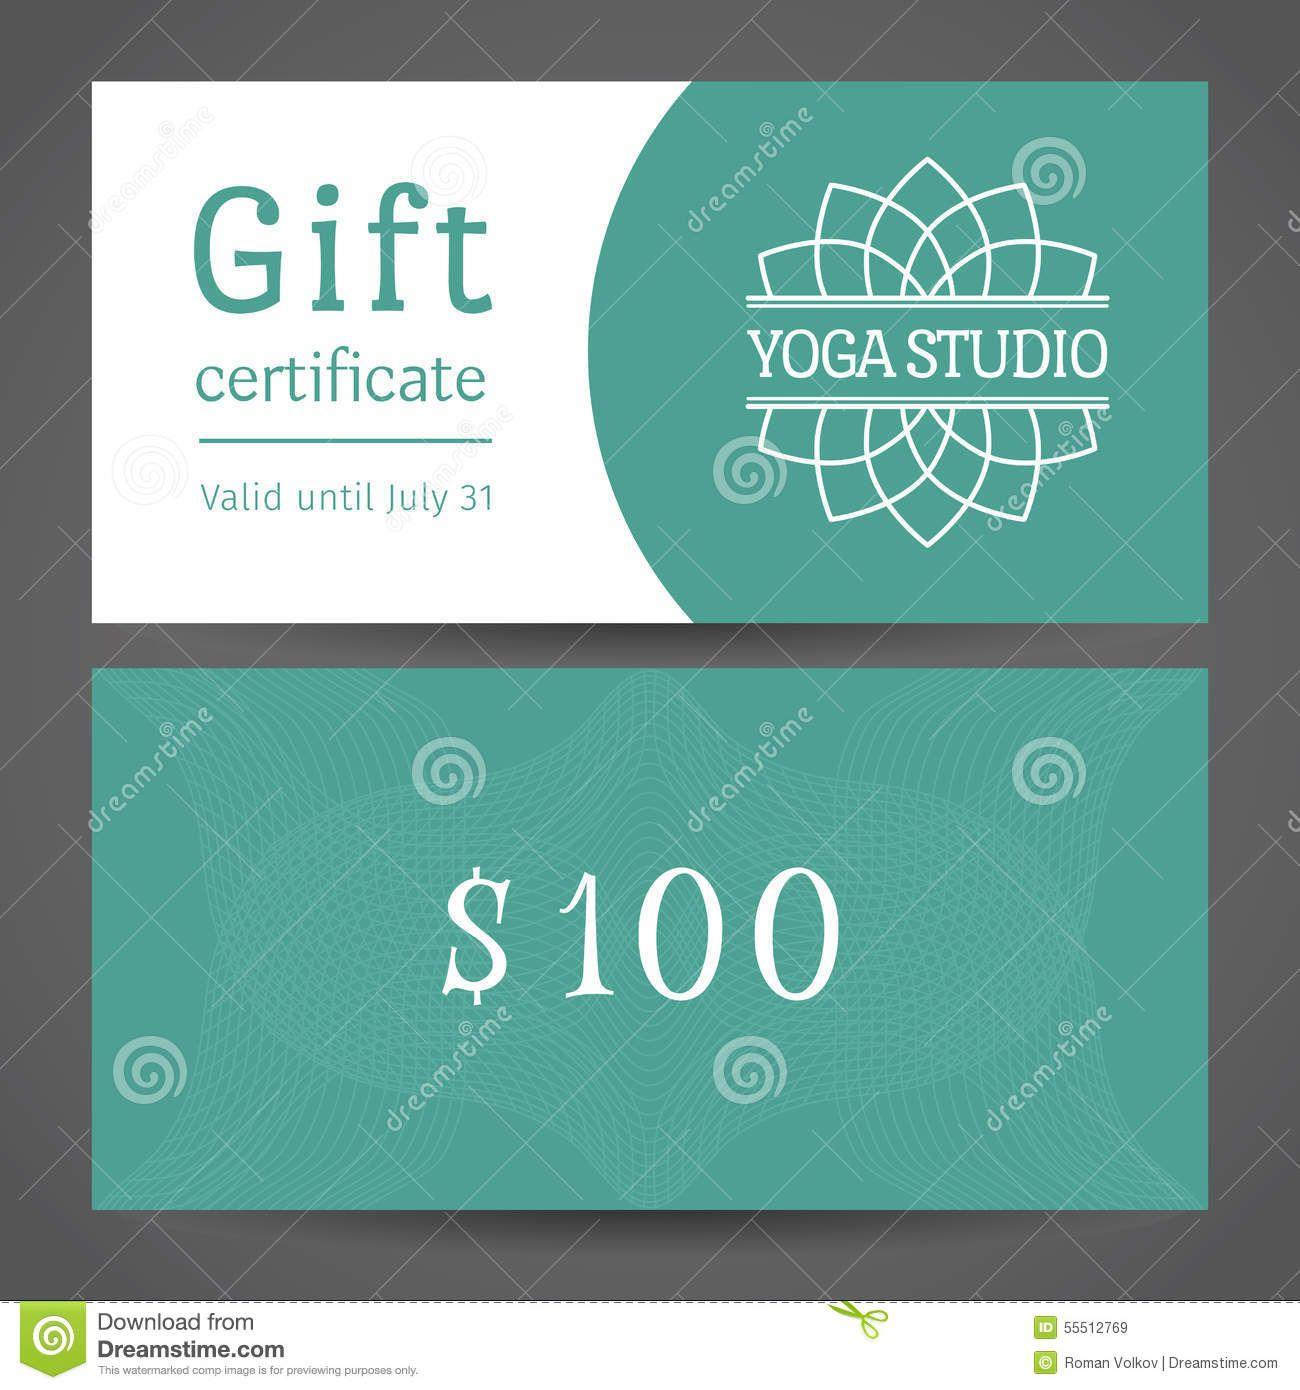 Yoga Studio Vector Gift Certificate Template Stock Vector Image 55512769 Gift Certificate Template Certificate Templates Yoga Gifts Yoga gift certificate template free